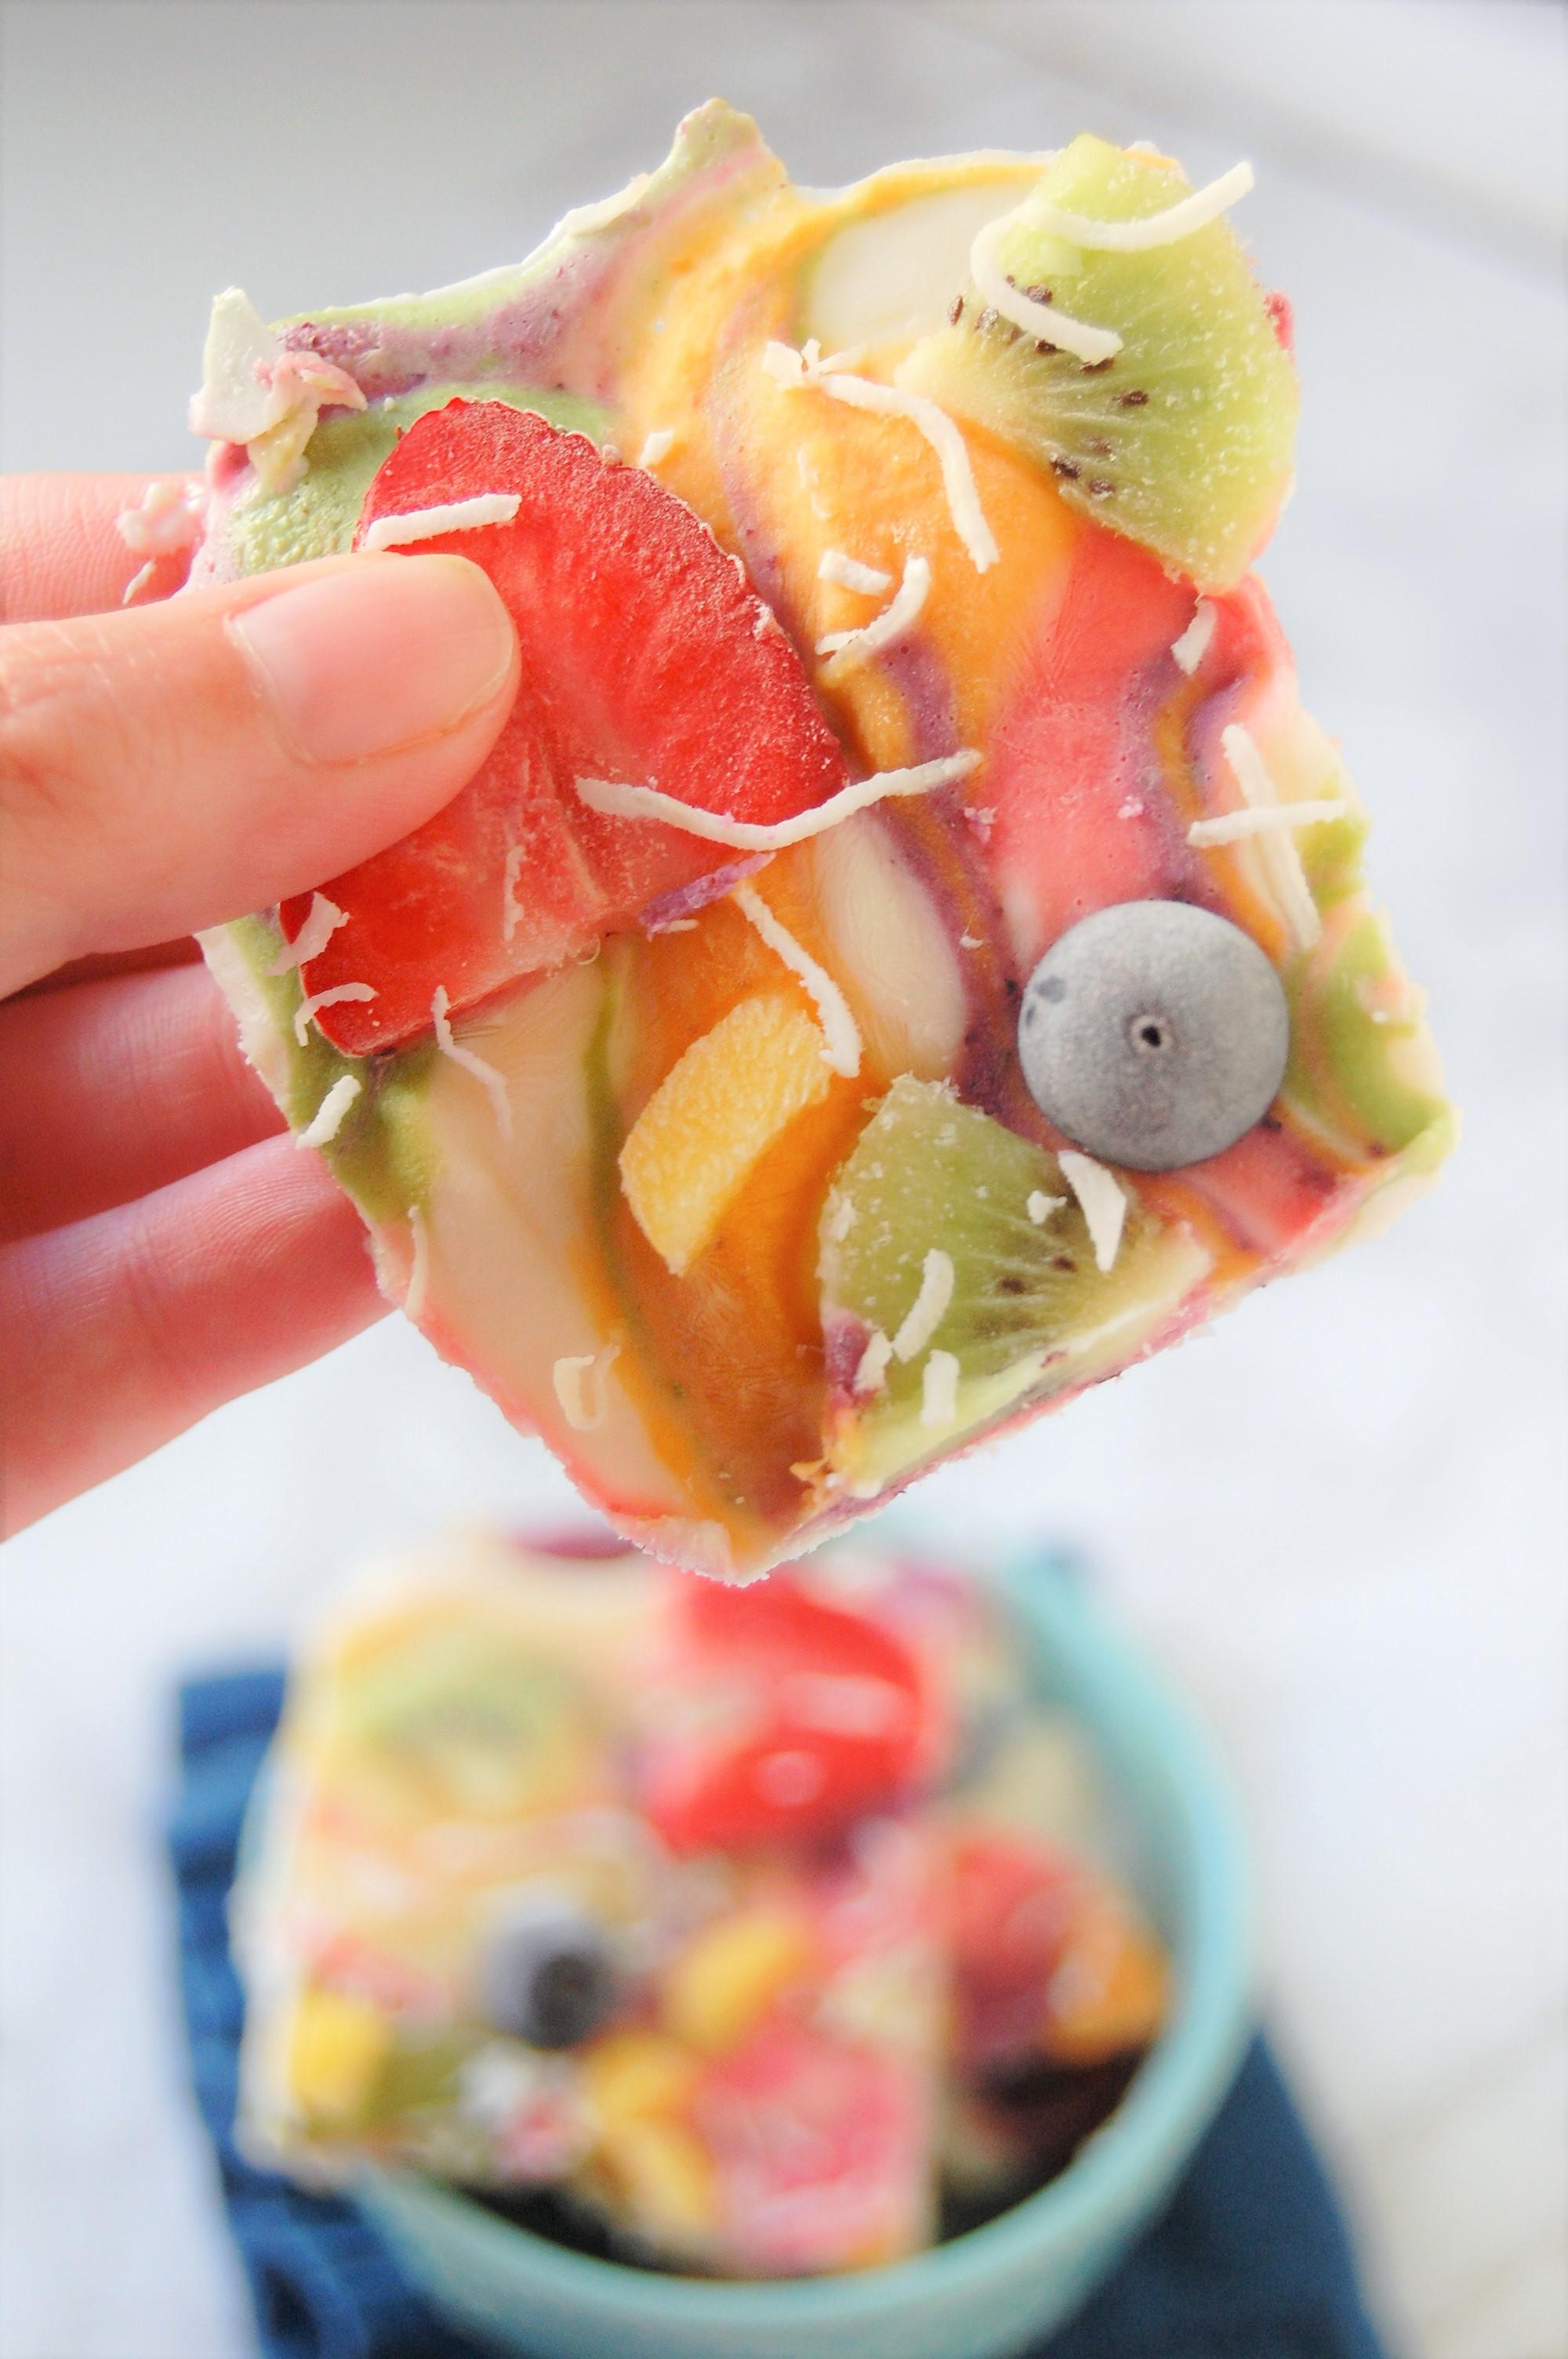 Rainbow Frozen Yogurt Bark | Healthy Recipe | Recipes | Rainbow Food | Frozen Yogurt Bark | Nutrition | Dietitian | Fruits | Vegetables | Fun Food | Cooking with Kids | Healthy Snack | Healthy Treat